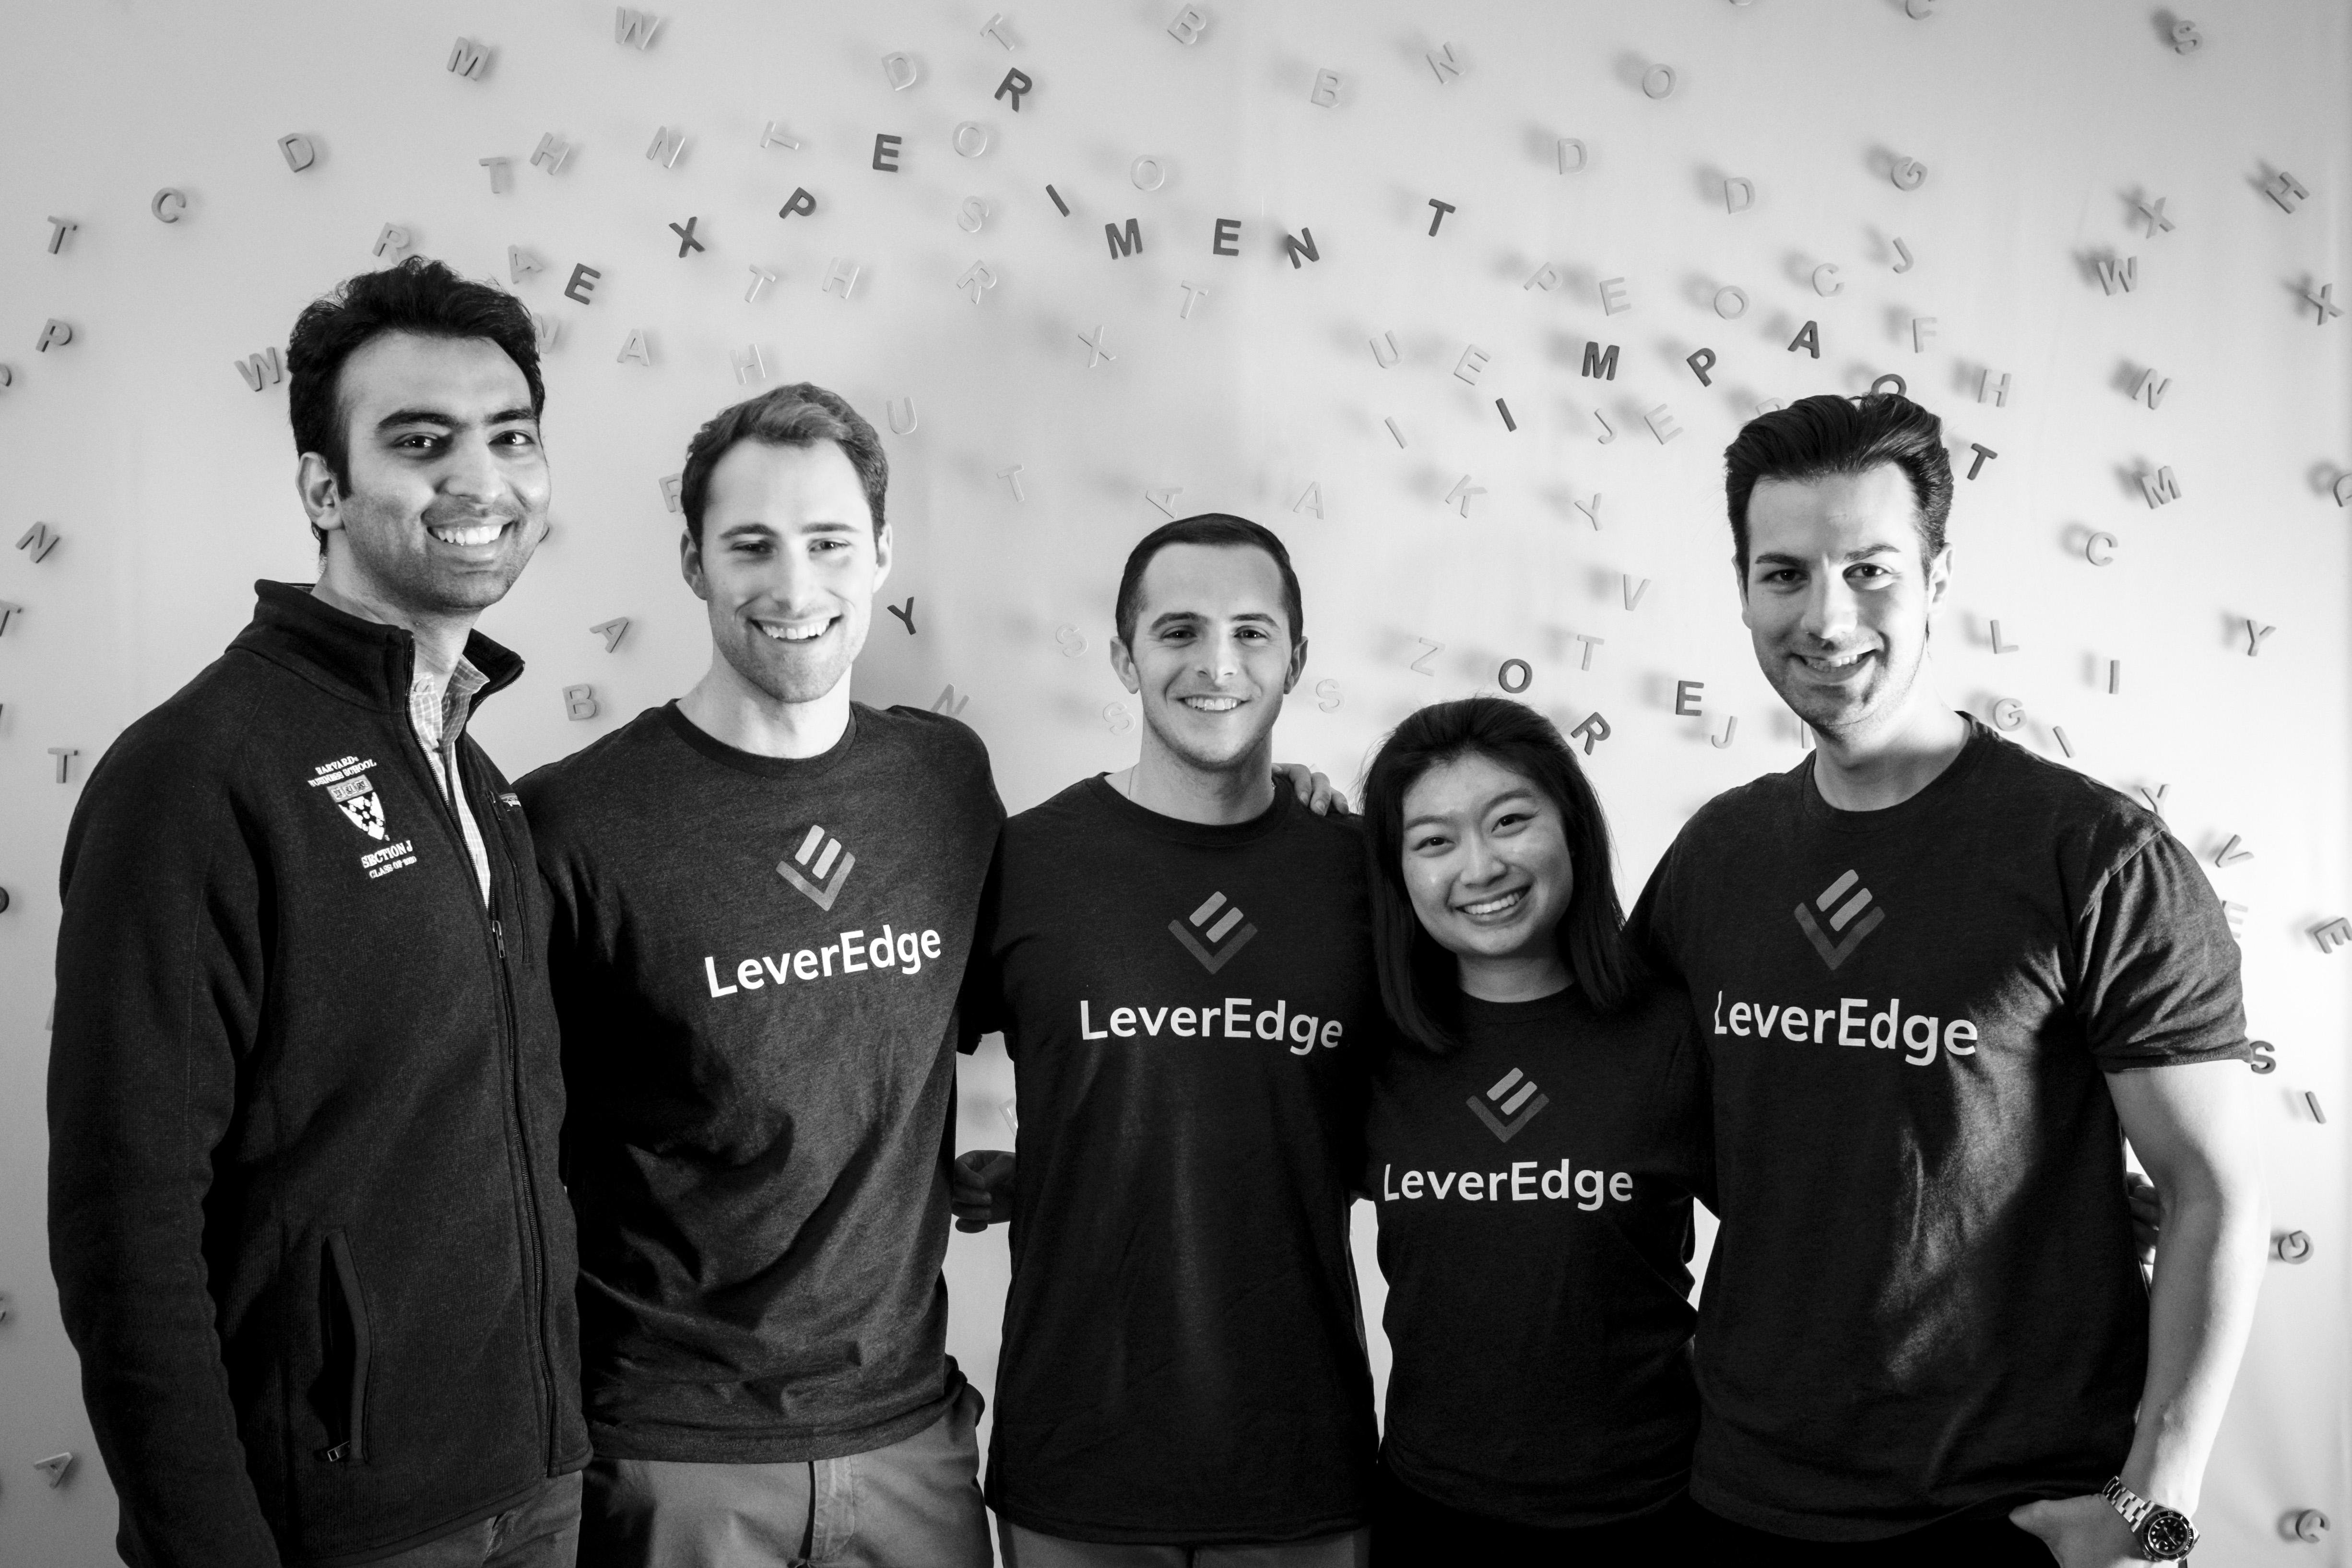 LeverEdge Association